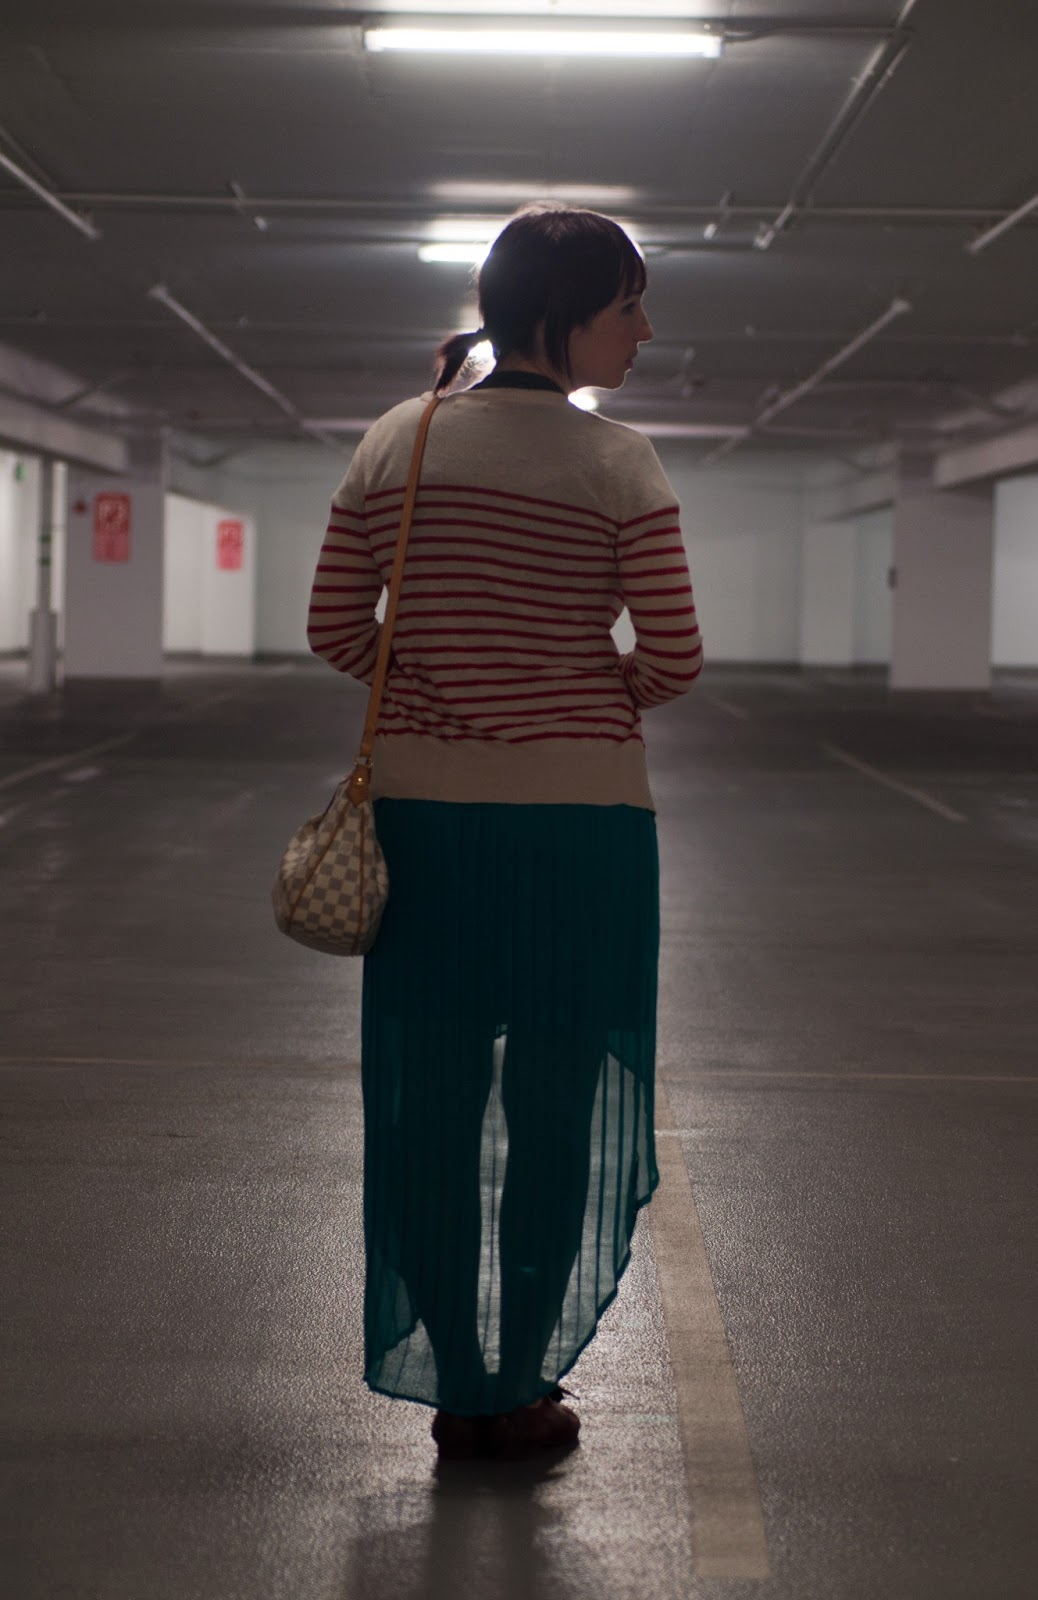 fashion blogger, ootd, mens fashion blog, womens fashion blog, home t, arizona, bdg. bdg, anchor, stripes, pleated skirt, teal skirt, american apparel, louis vuitton, louis vuitton crossbody, siracusa mm, damier, louis vuitton handbag, target, naya, nordstrom, target skirt, oxford, anthropologie ootd, mac, mac lipstick, mac sheen lipstick, parking garage, salt lake city, utah blogger, utah fashion blogger, mormon blogger, mormon clothing blogger, red and white stripes, city creek mall, see thru skirt, leather,